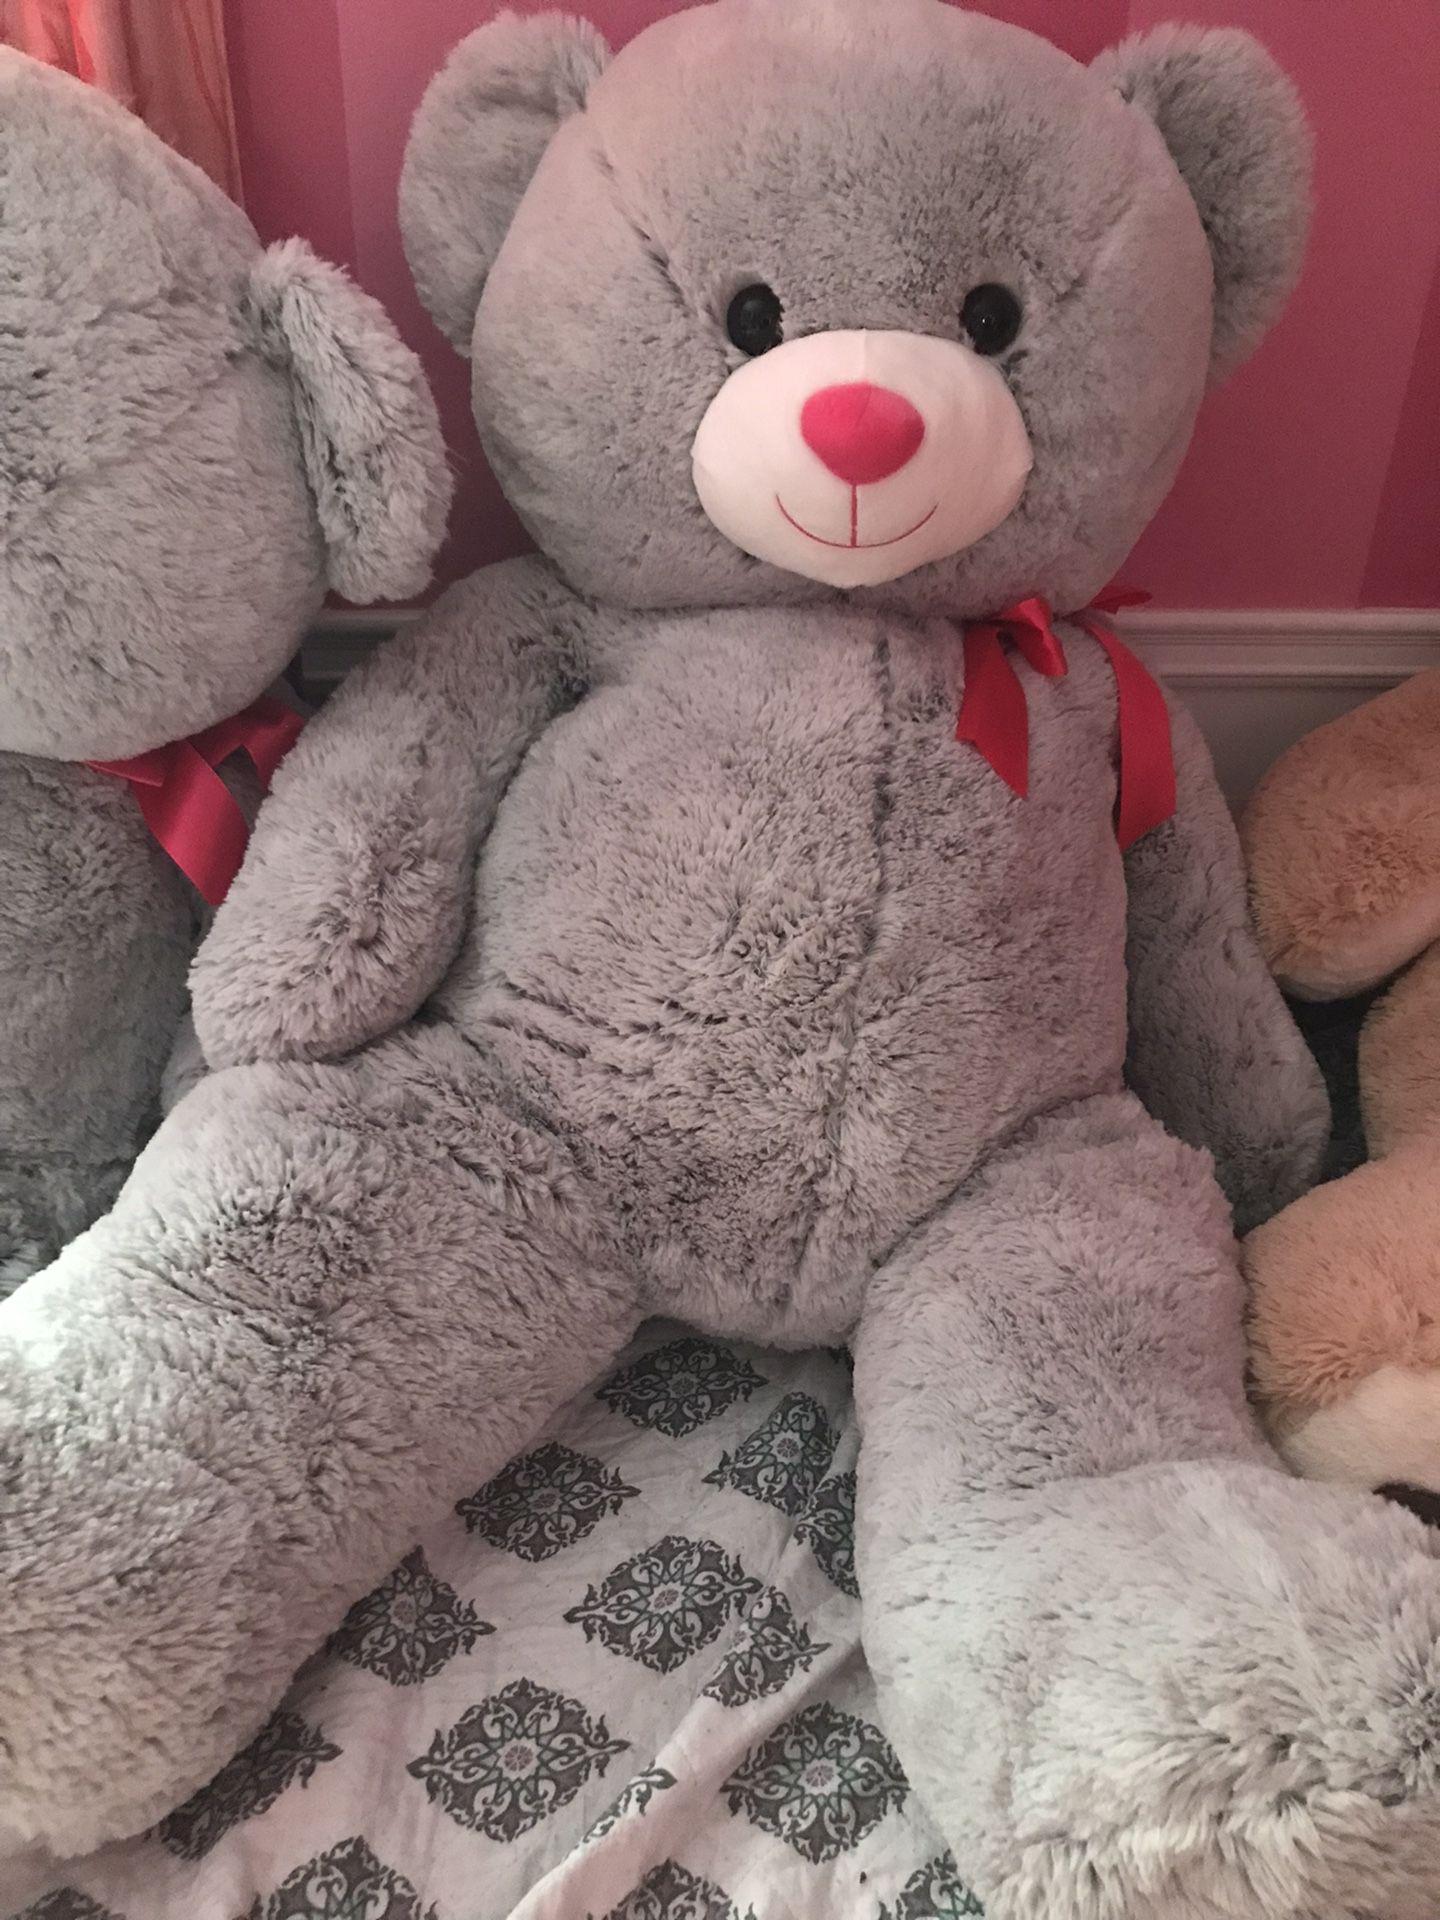 Giant Bear Teddy Plush Stuffed Animal